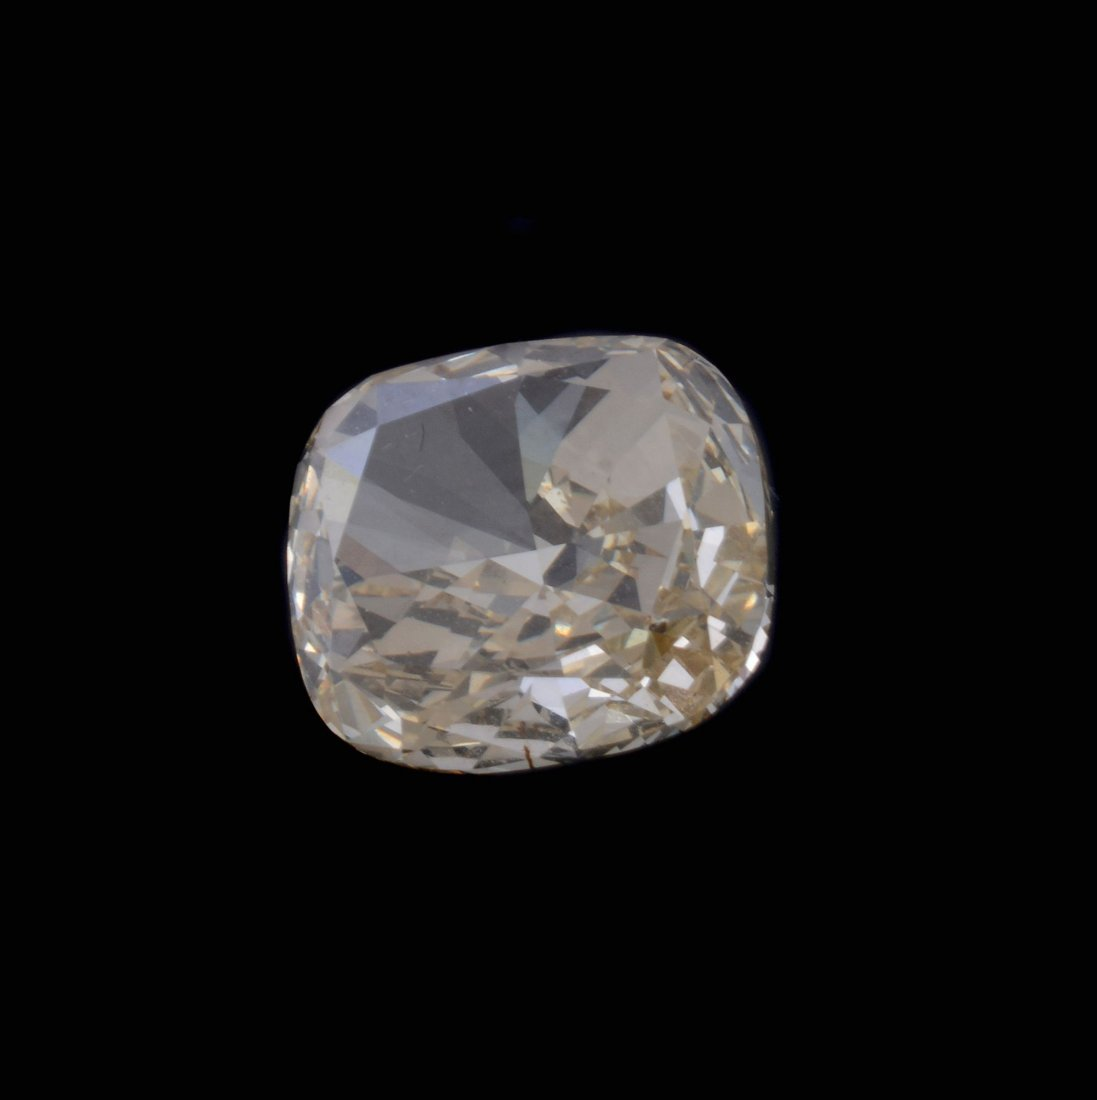 A loose cushion cut yellow diamond, weighing 3.00